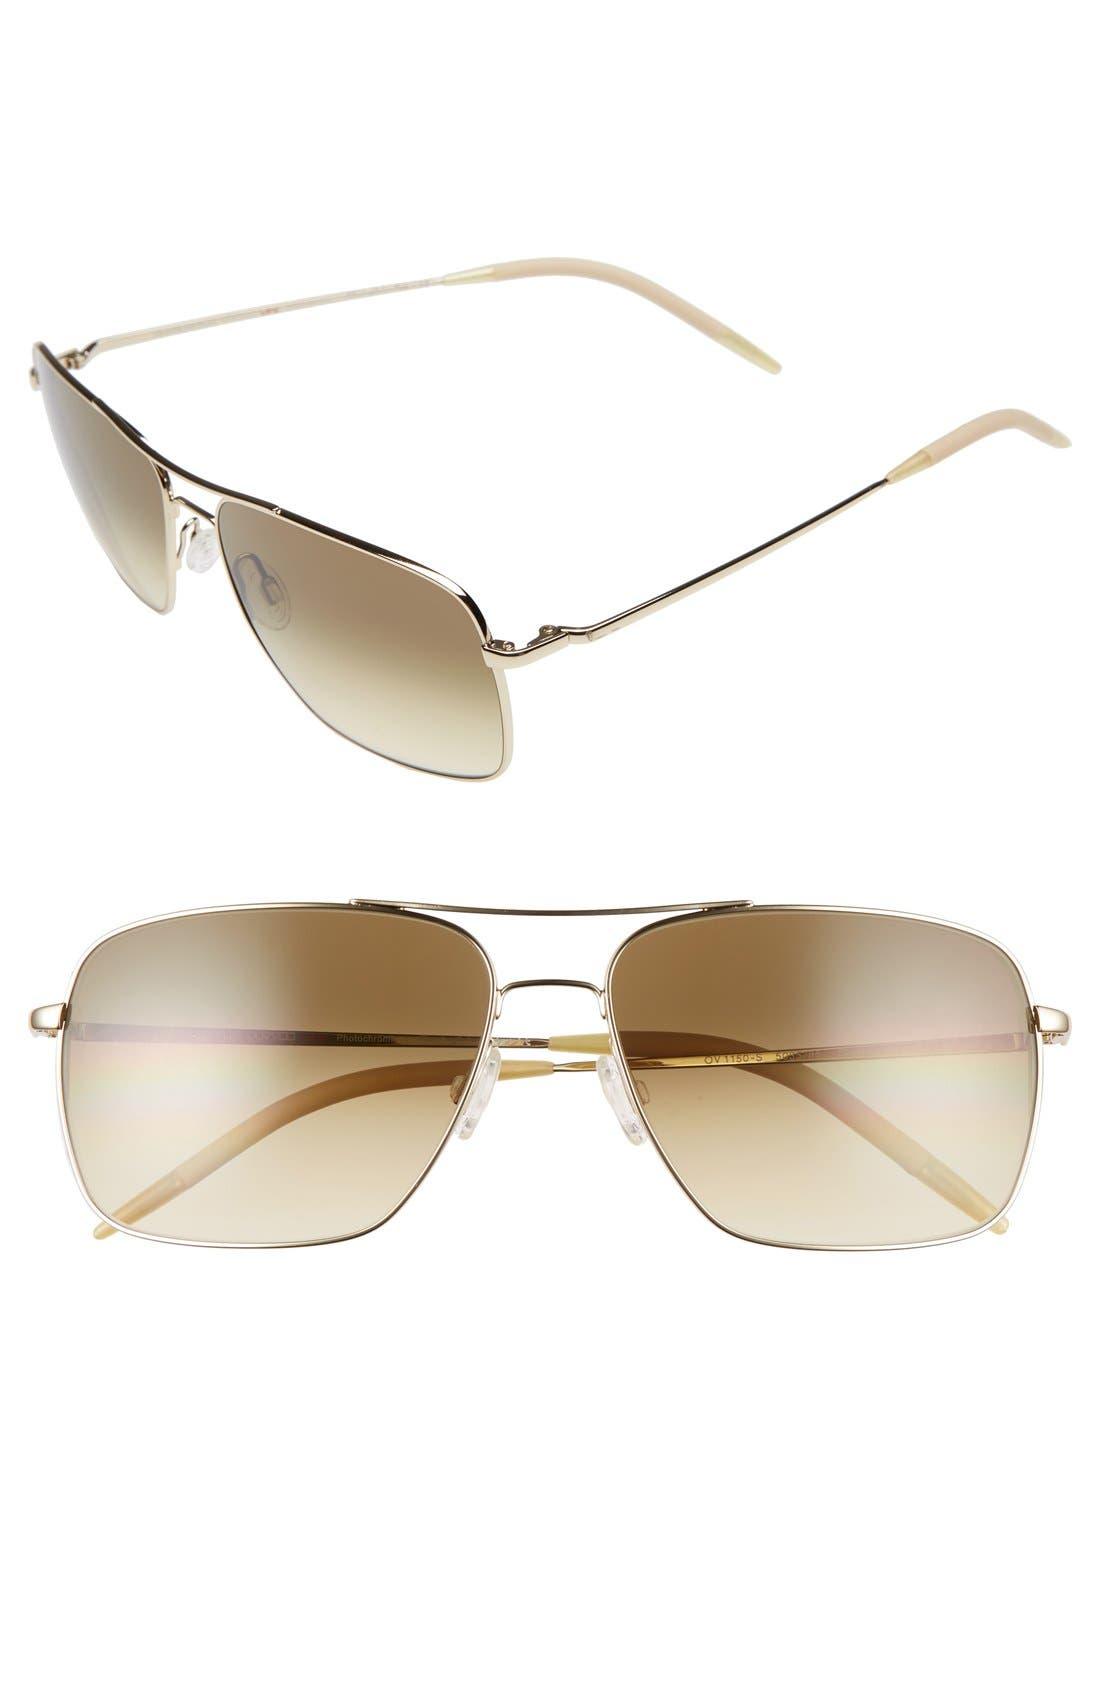 Clifton 58mm Aviator Sunglasses,                             Main thumbnail 1, color,                             GOLD